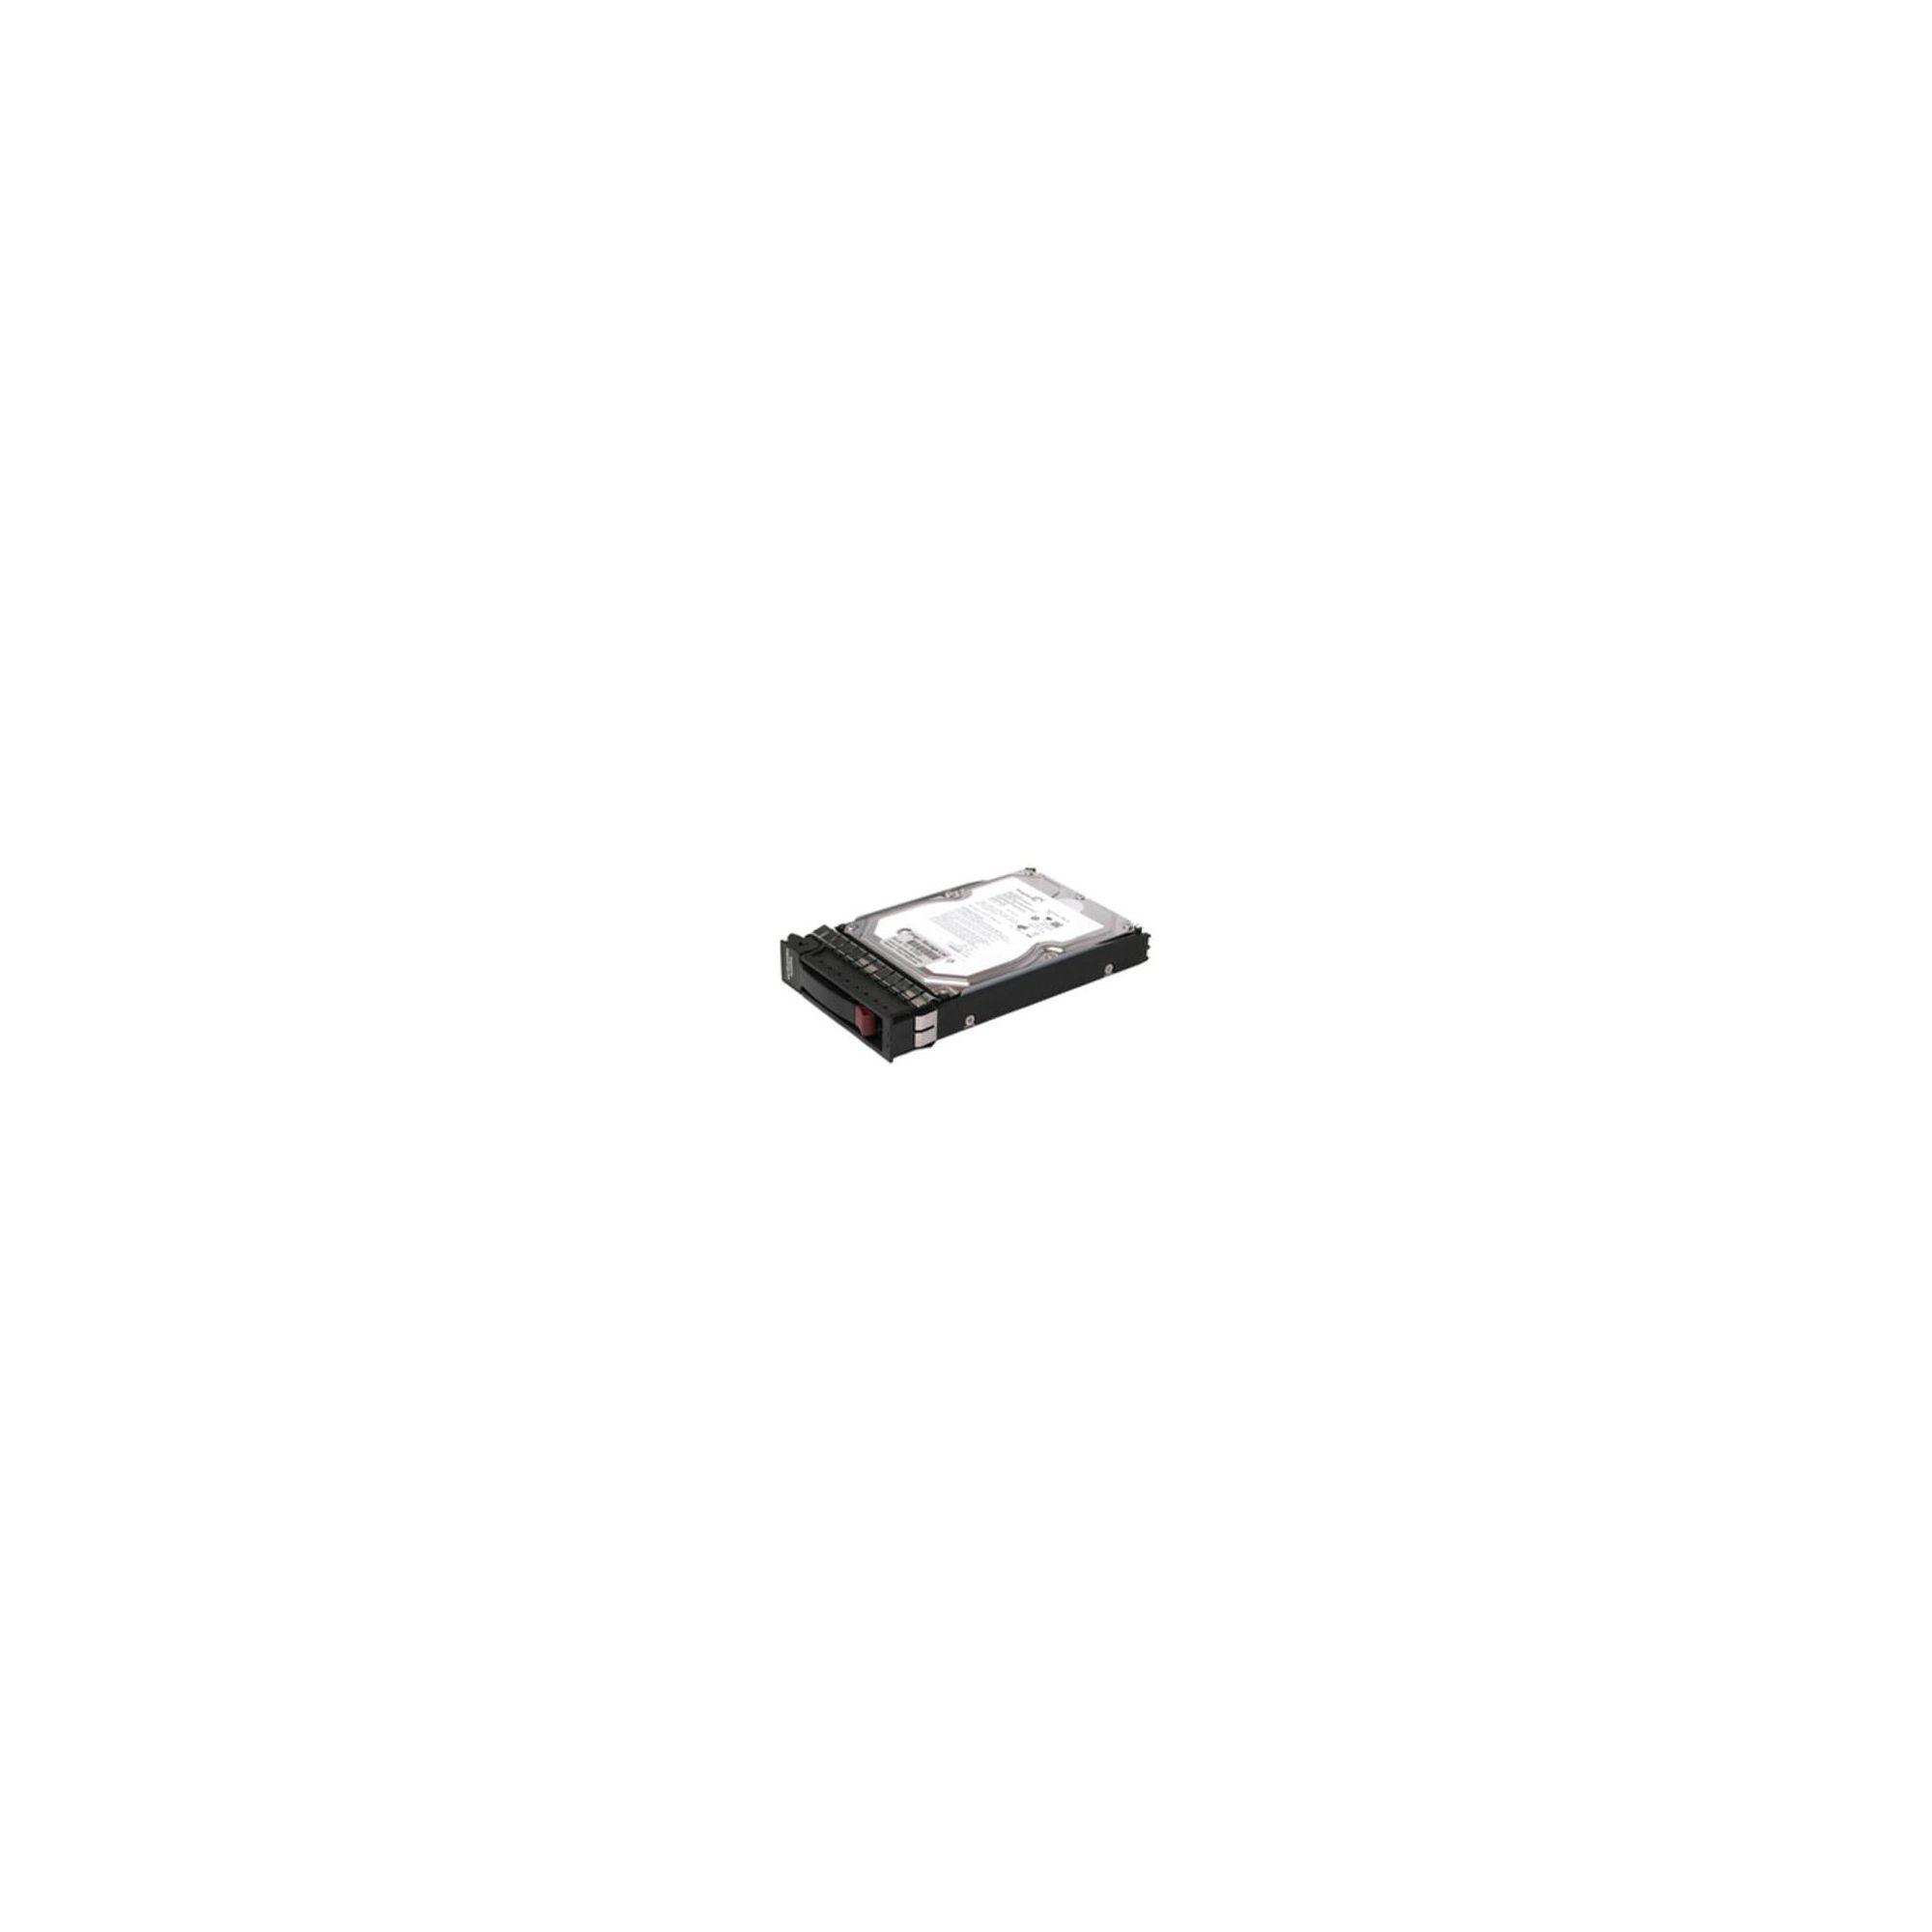 300GB 15K SAS Hot Swap Server Drive at Tesco Direct